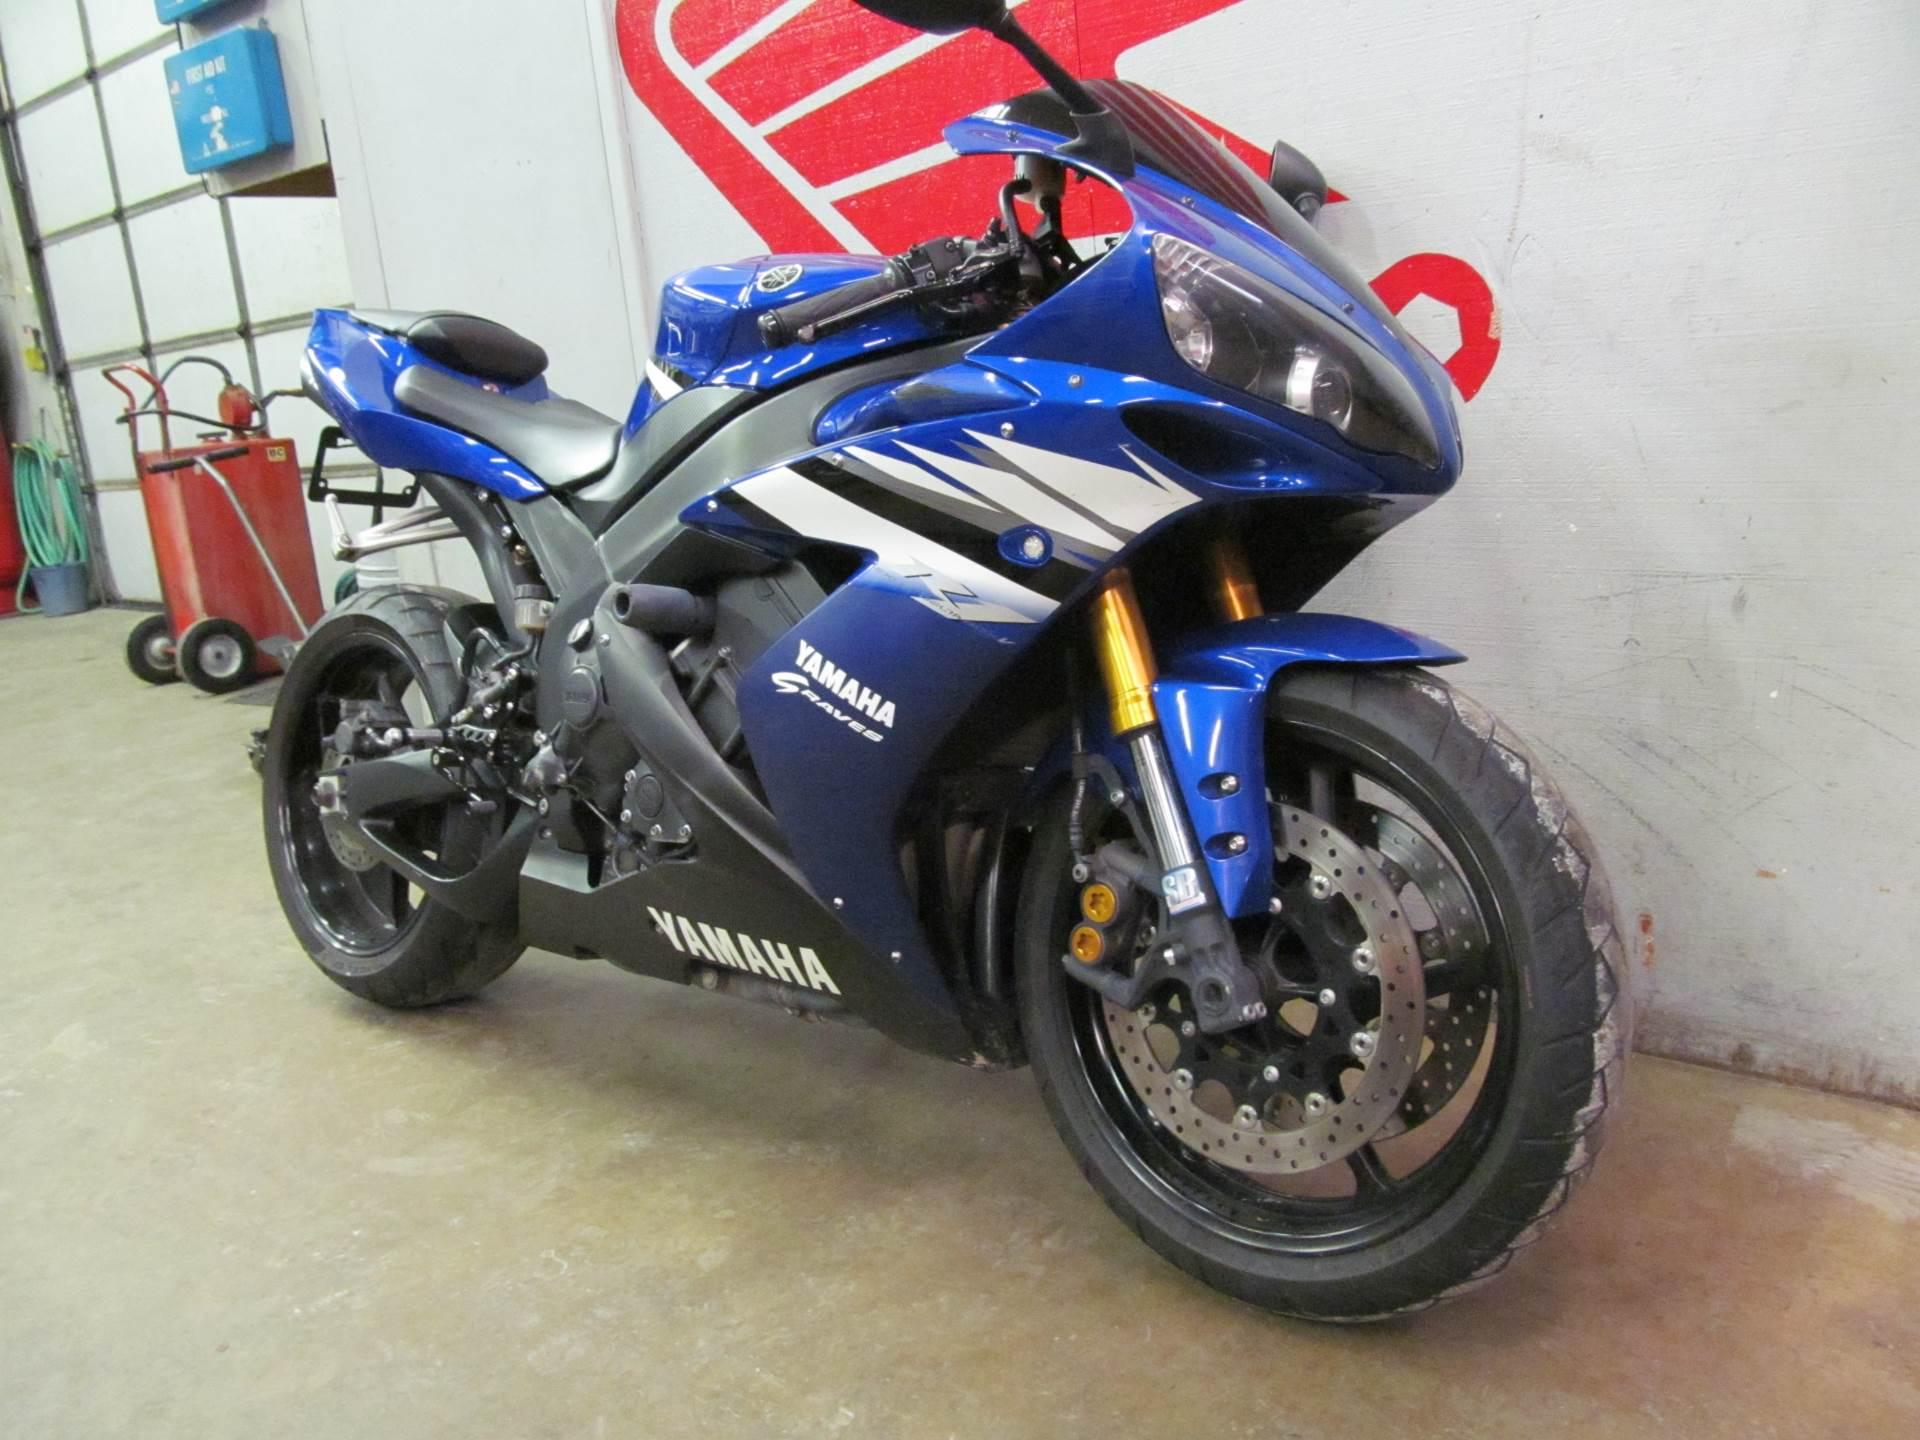 2006 Yamaha YZF-R1 3